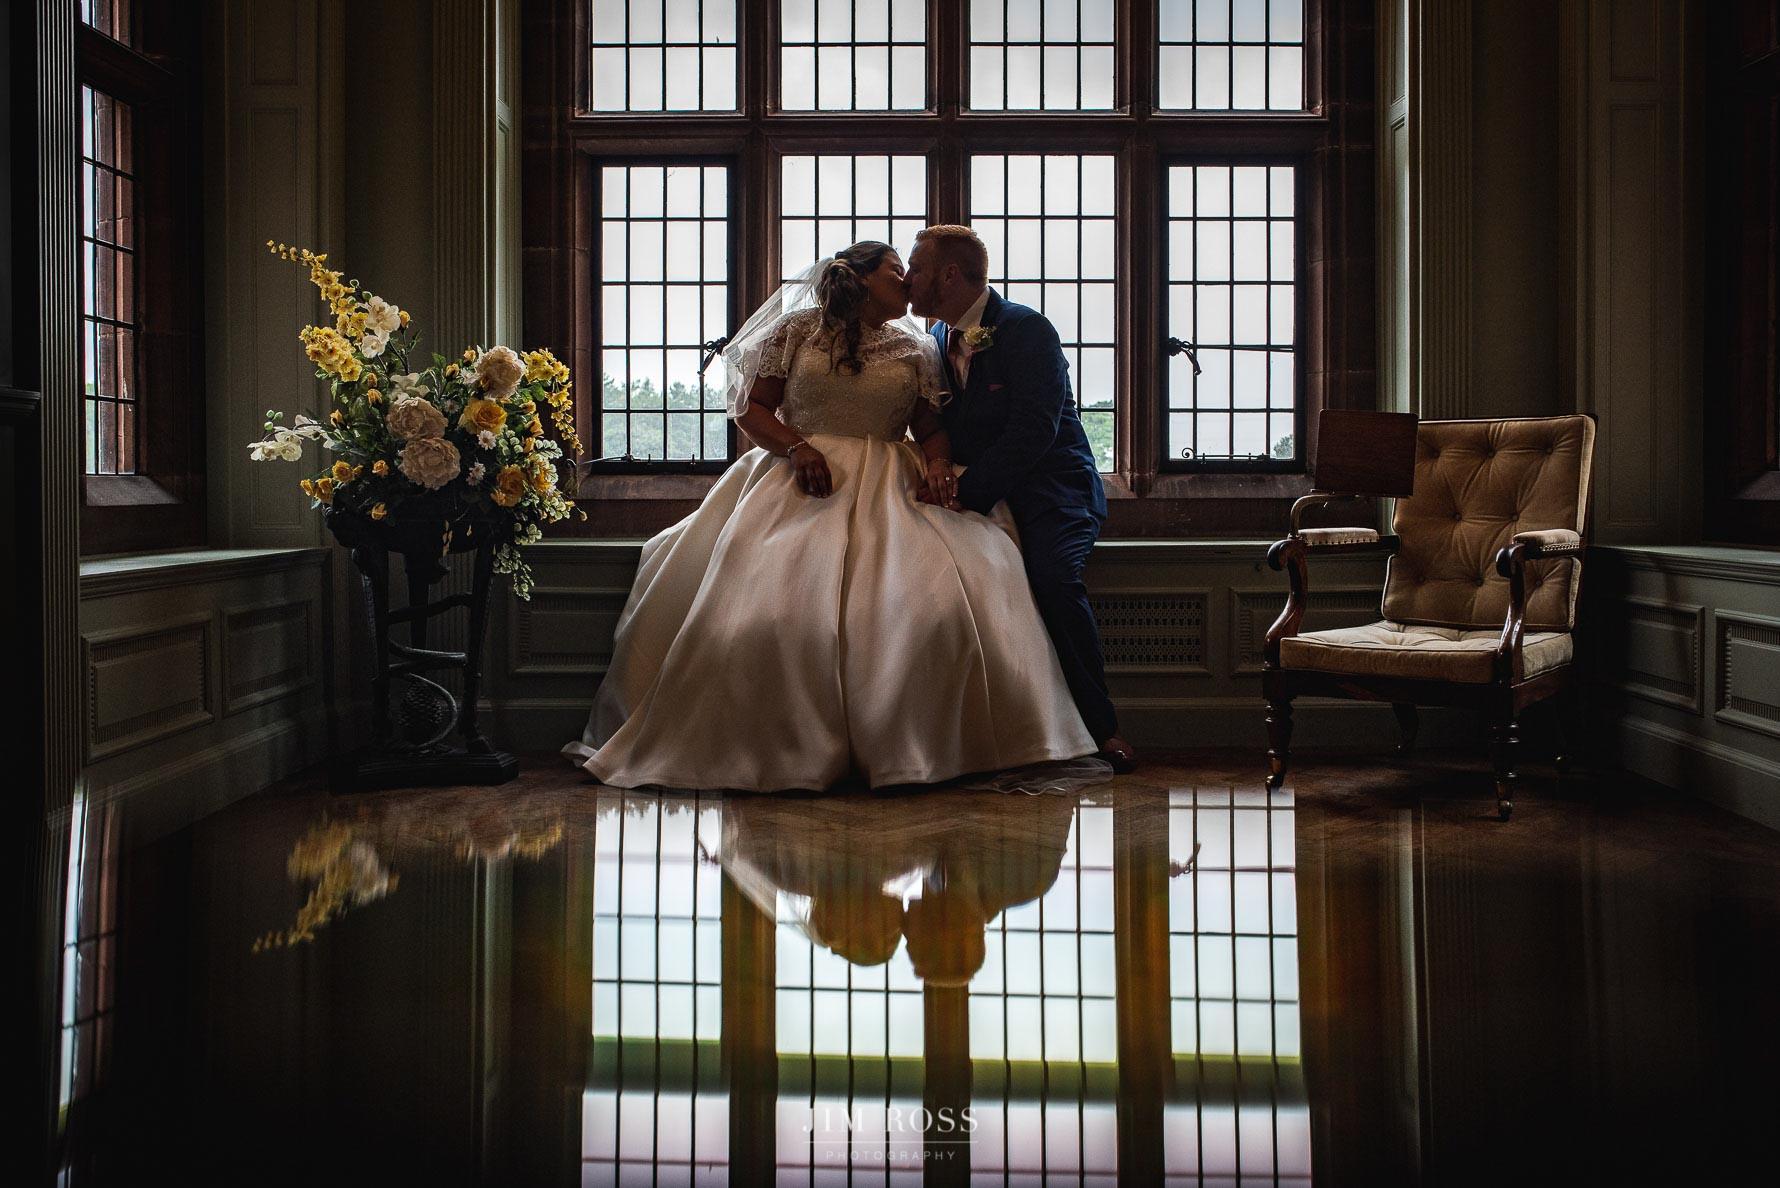 Bridal portrait in elegant Georgian room